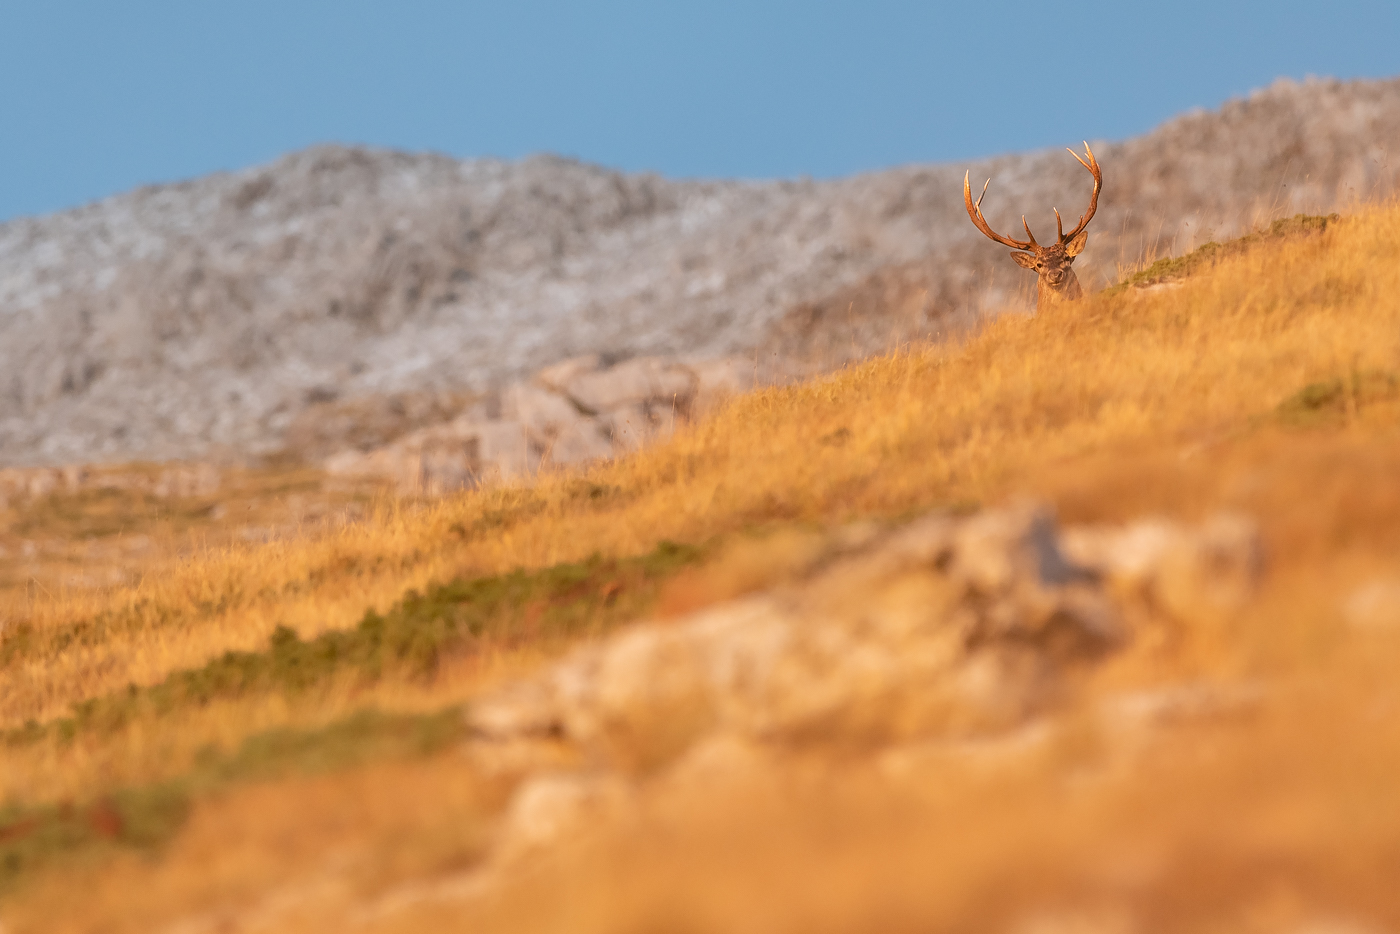 Cervo (Cervus elaphus) nella luce del tramonto - Monte Velino